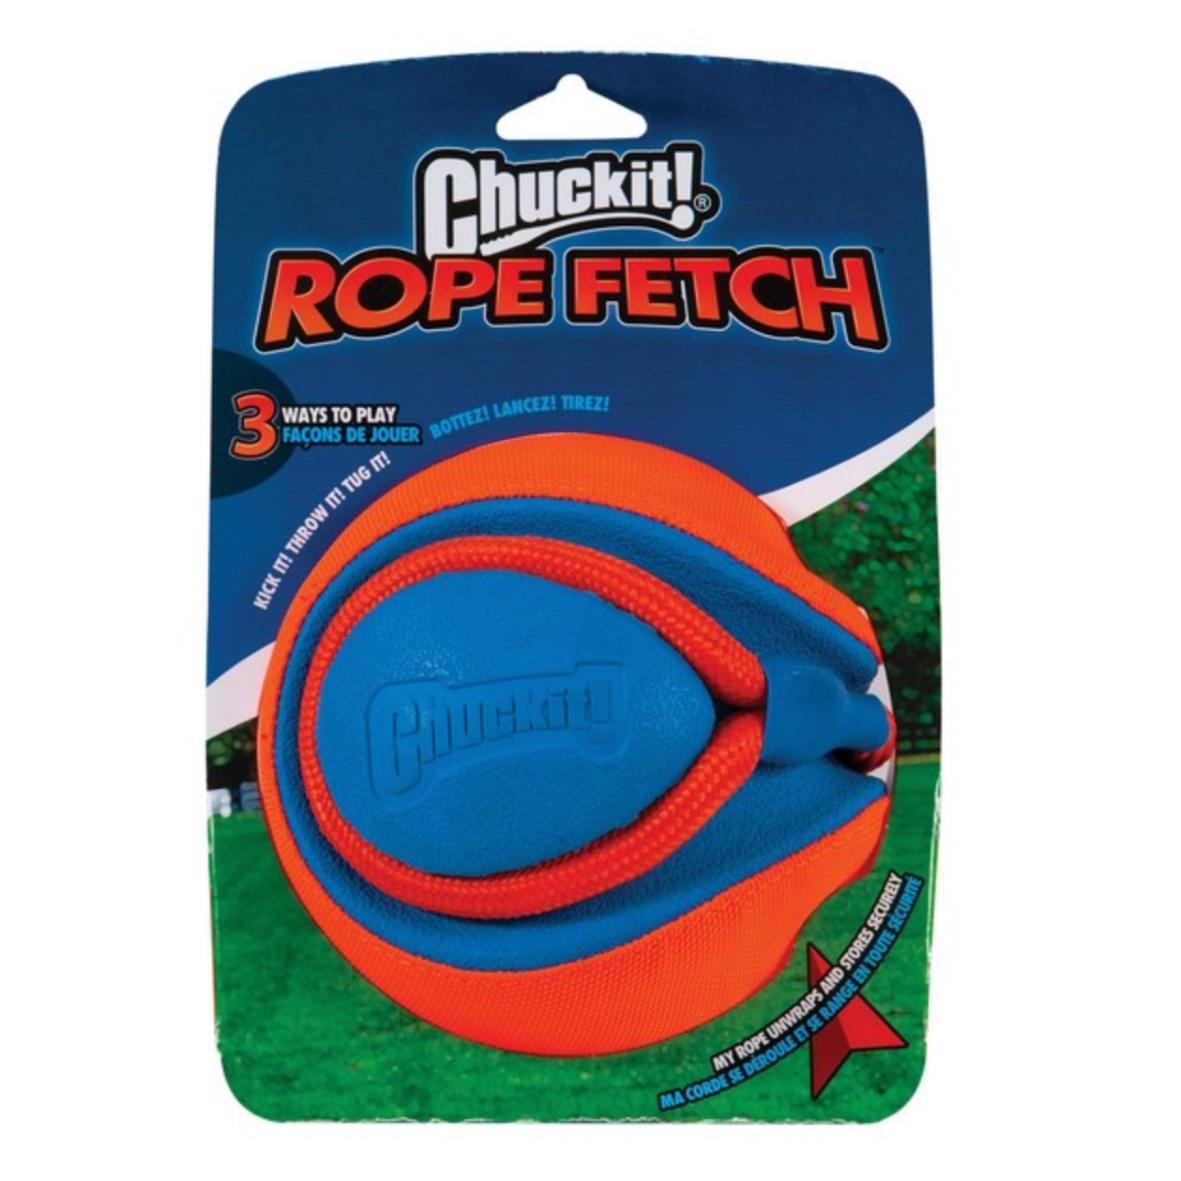 Chuckit! Rope Fetch 14cm